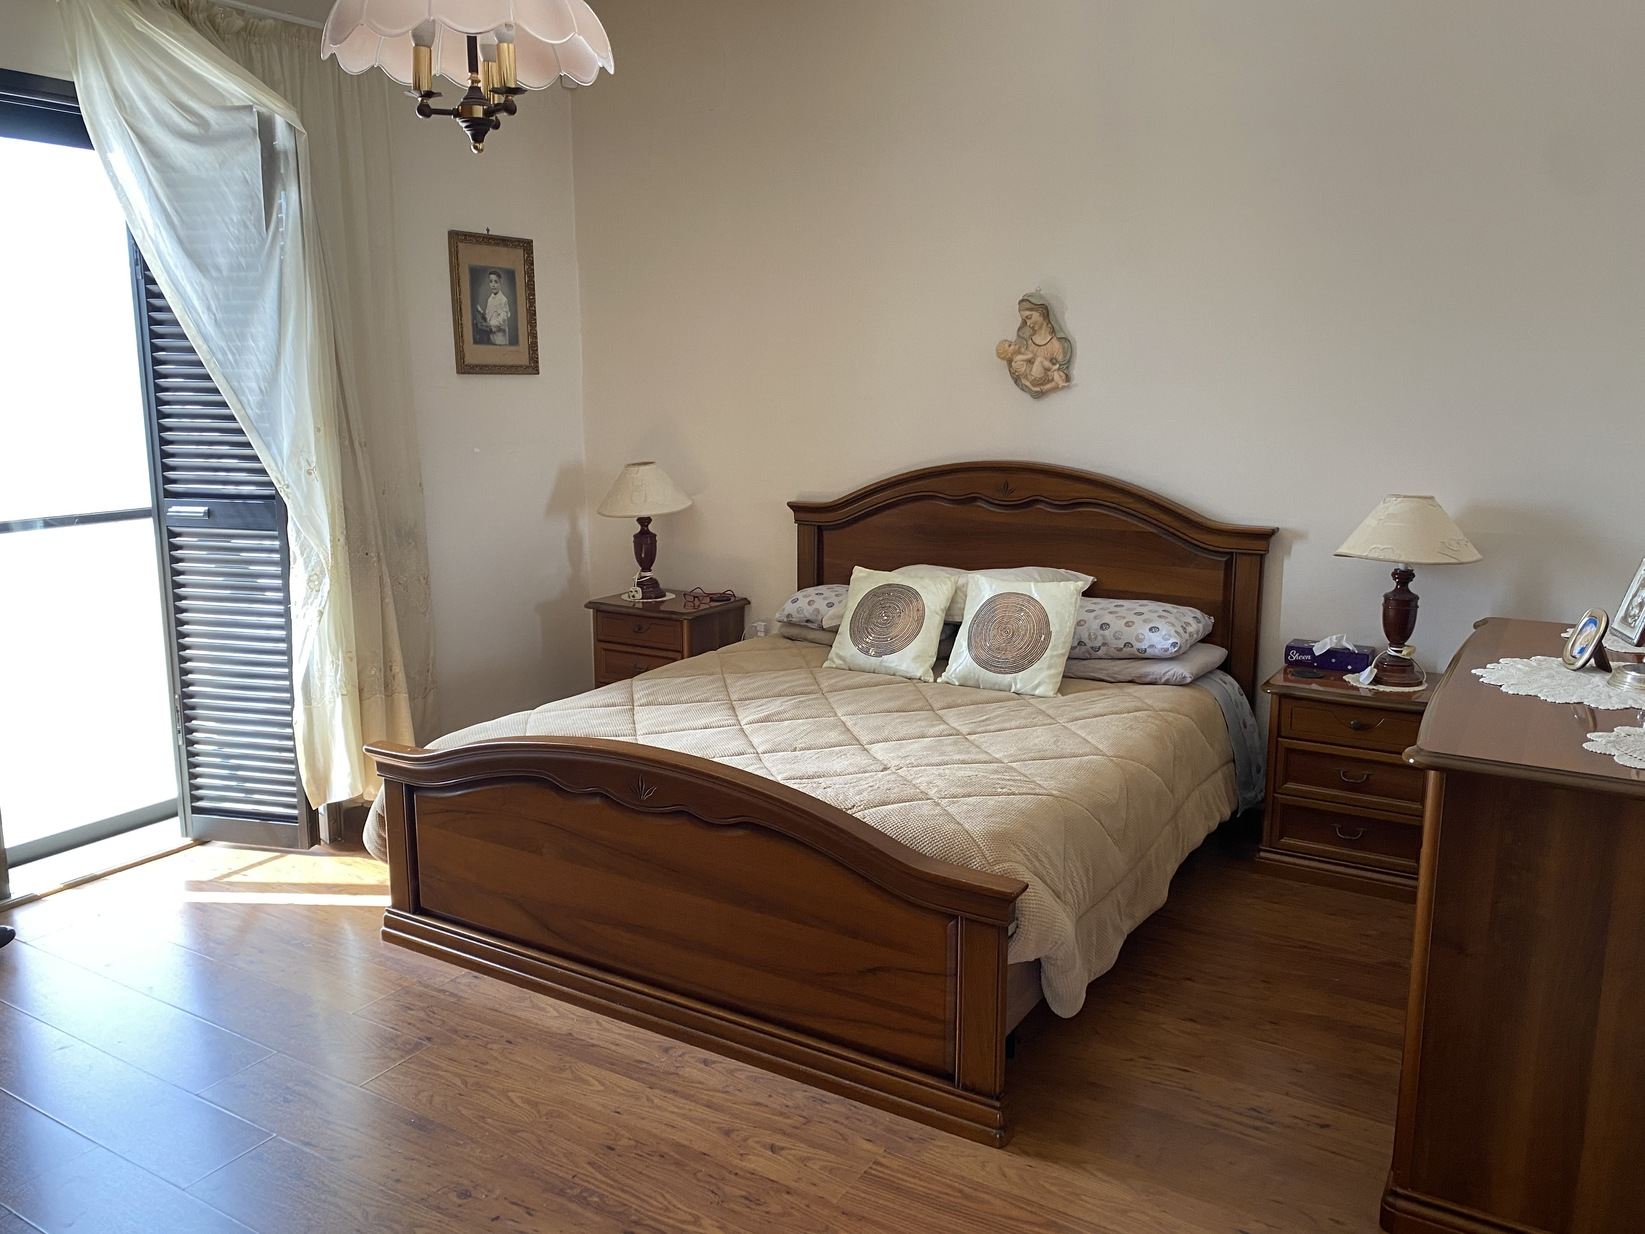 3 bed Villa For Sale in Marsaxlokk, Marsaxlokk - thumb 10